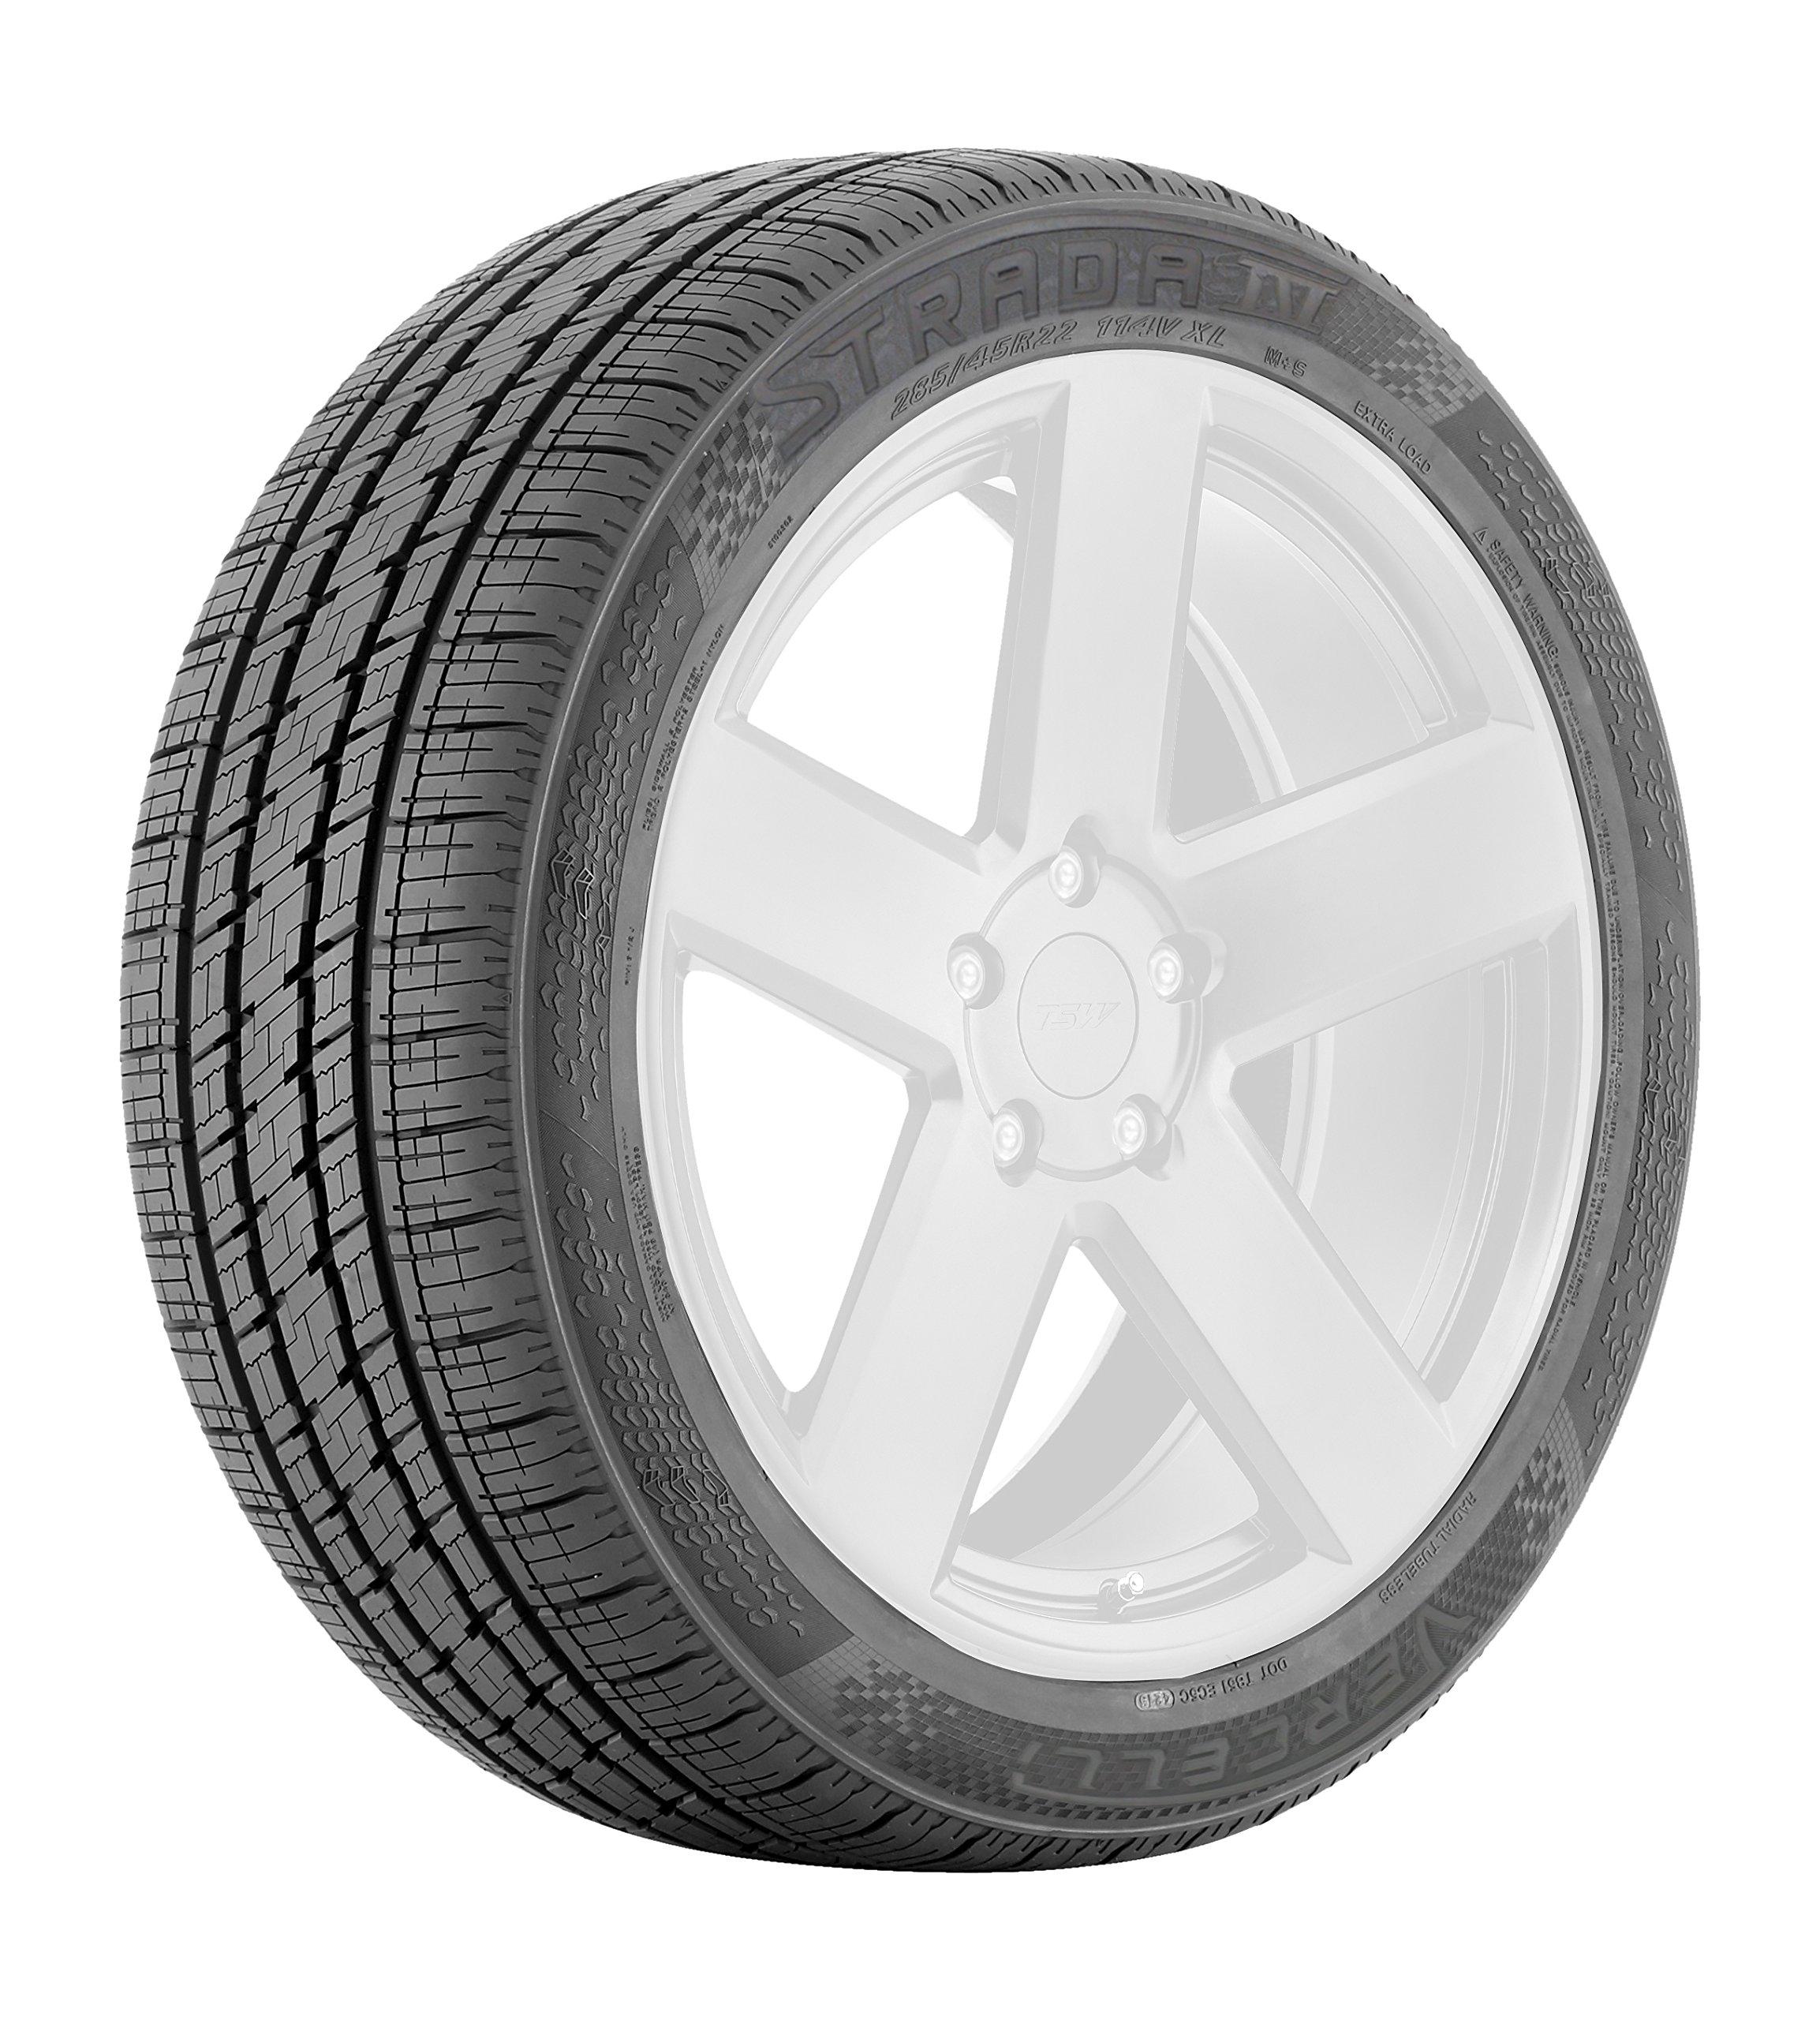 Vercelli Strada IV All-Season Radial Tire - 295/35R24 110V